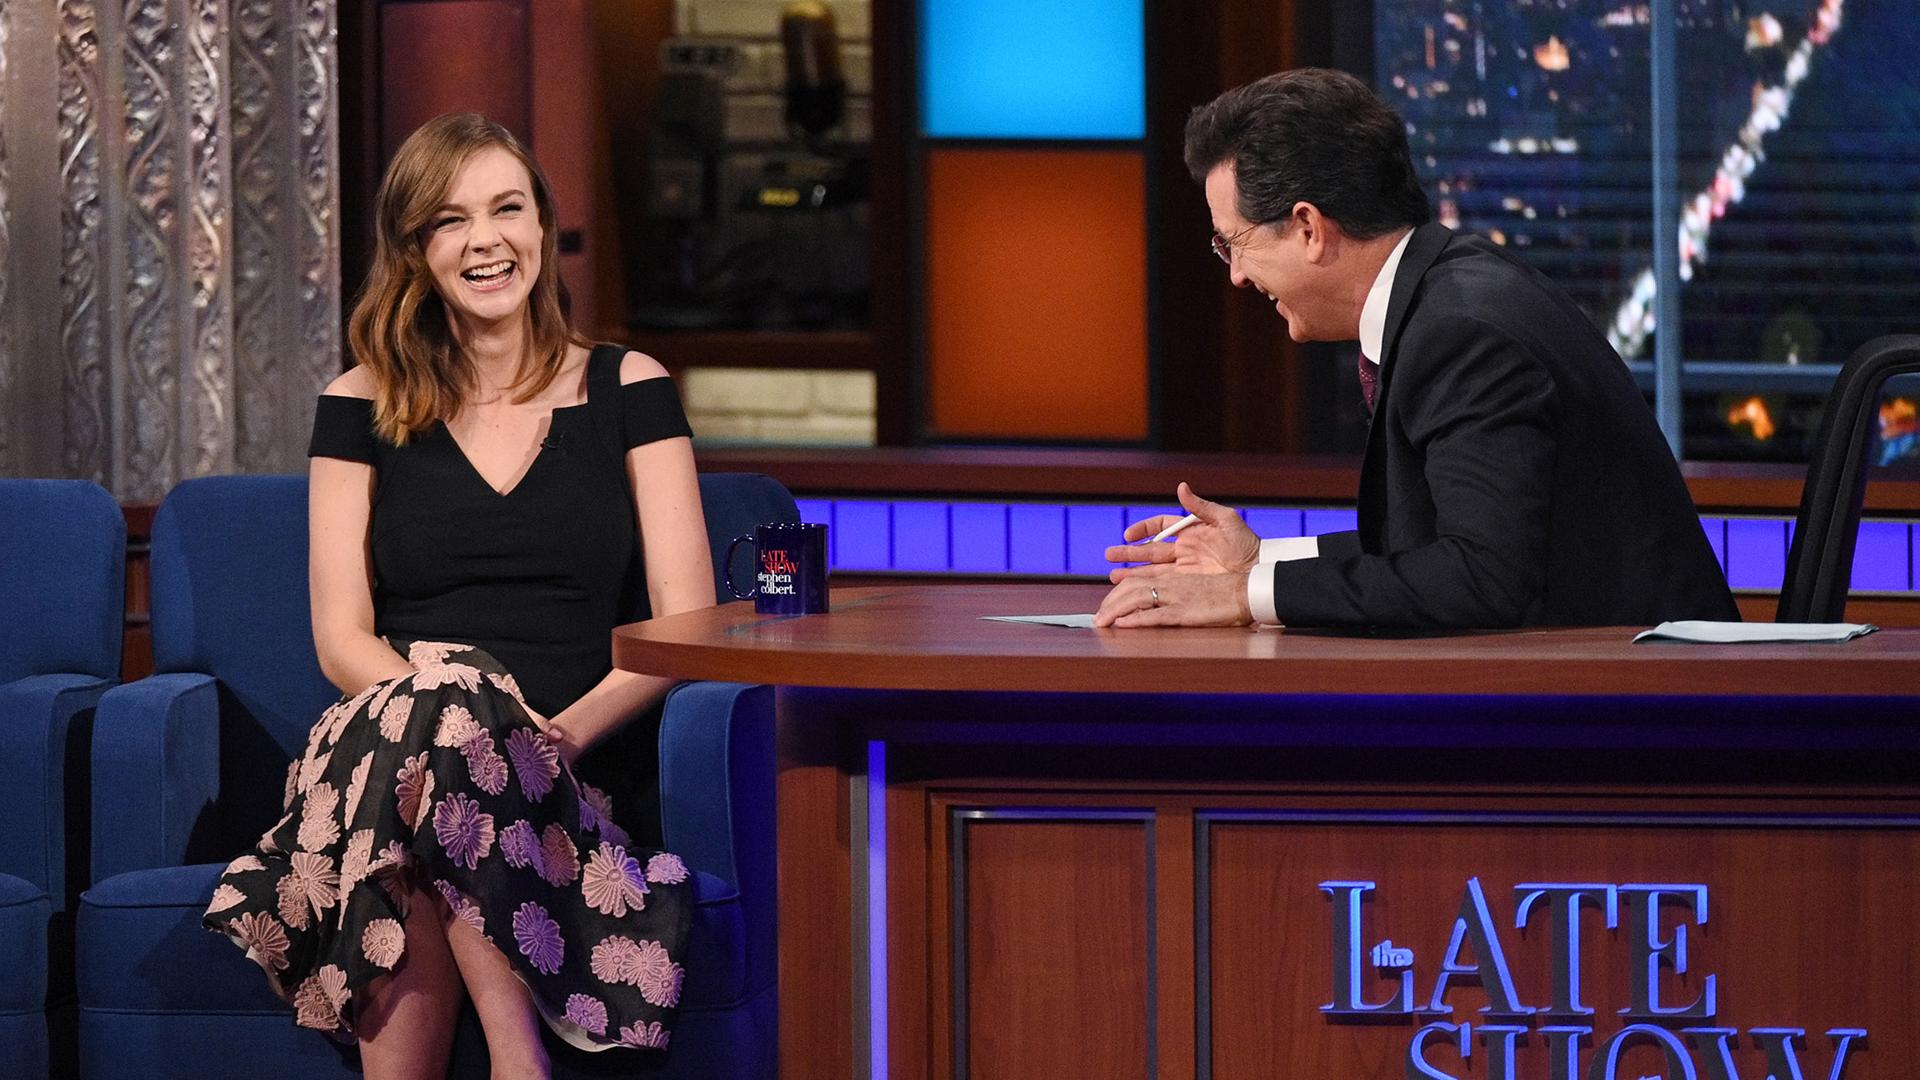 Carey Mulligan and Stephen Colbert